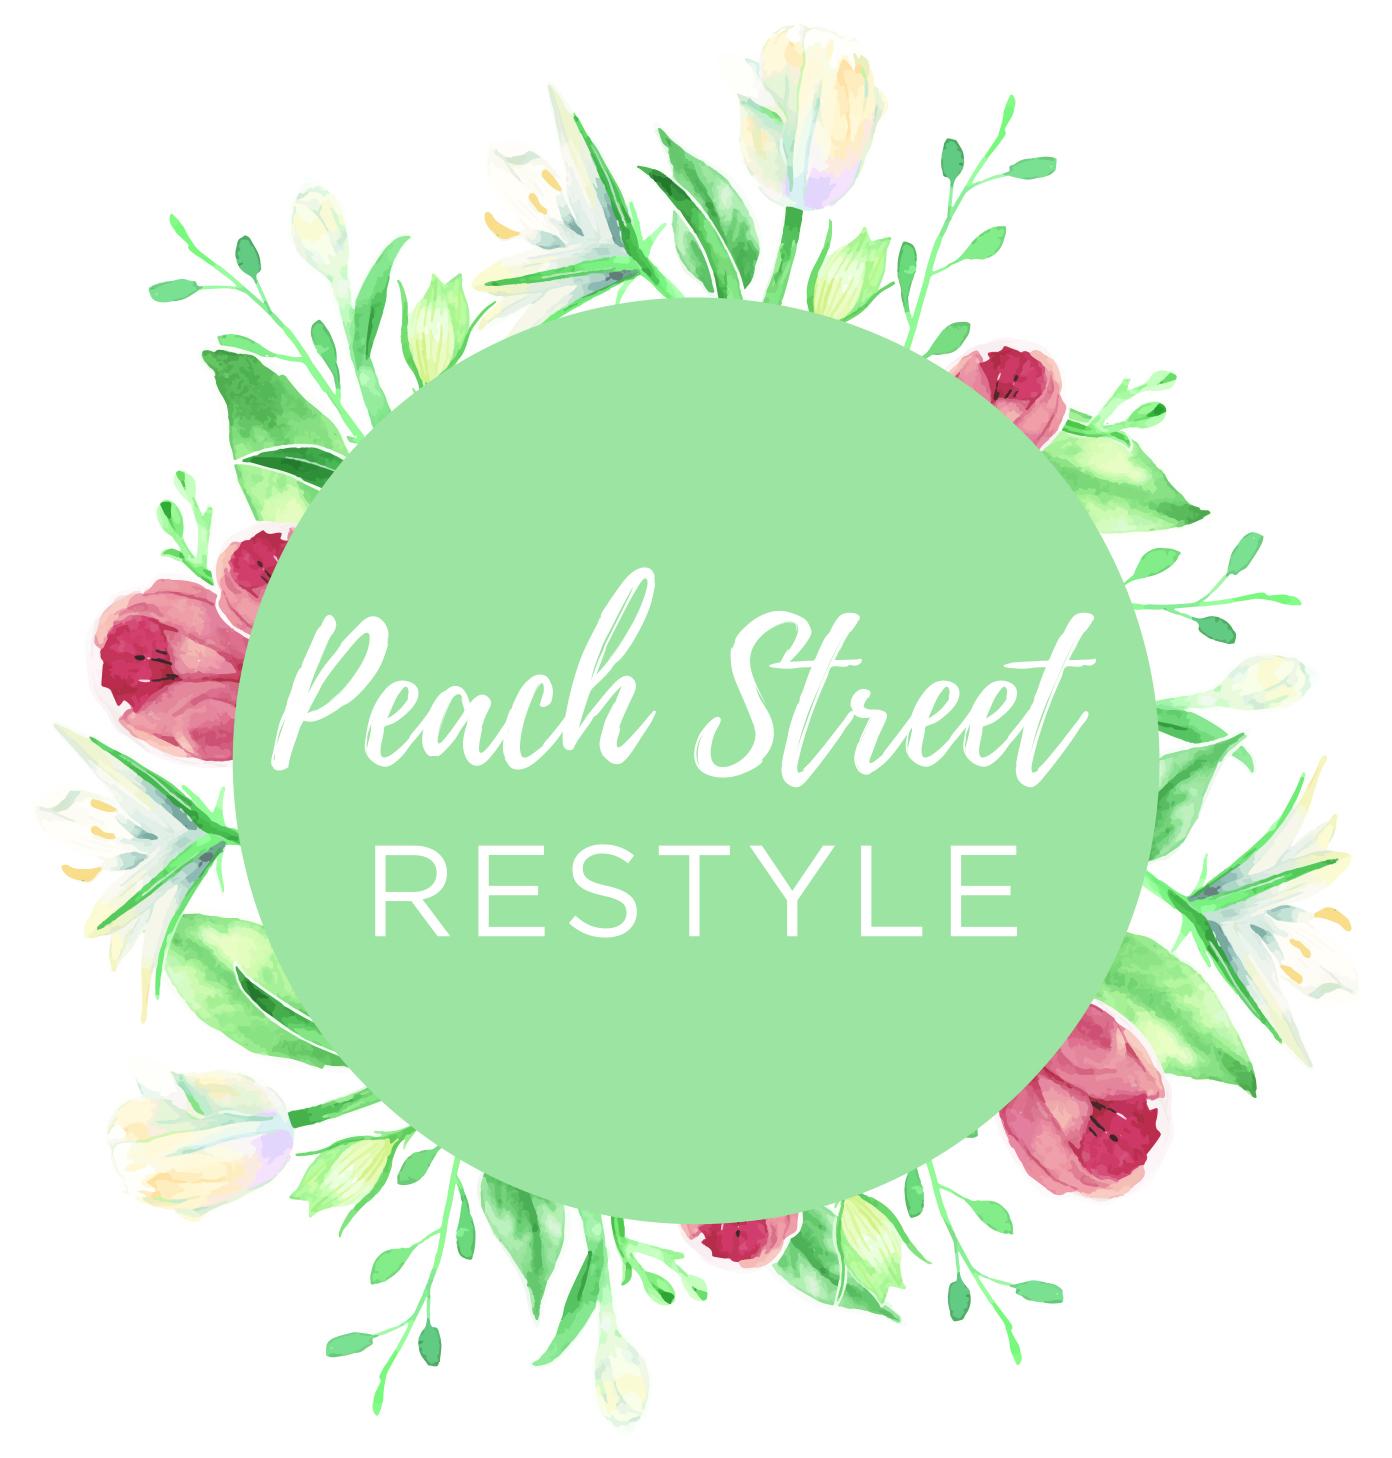 Peach Street Restyle logo